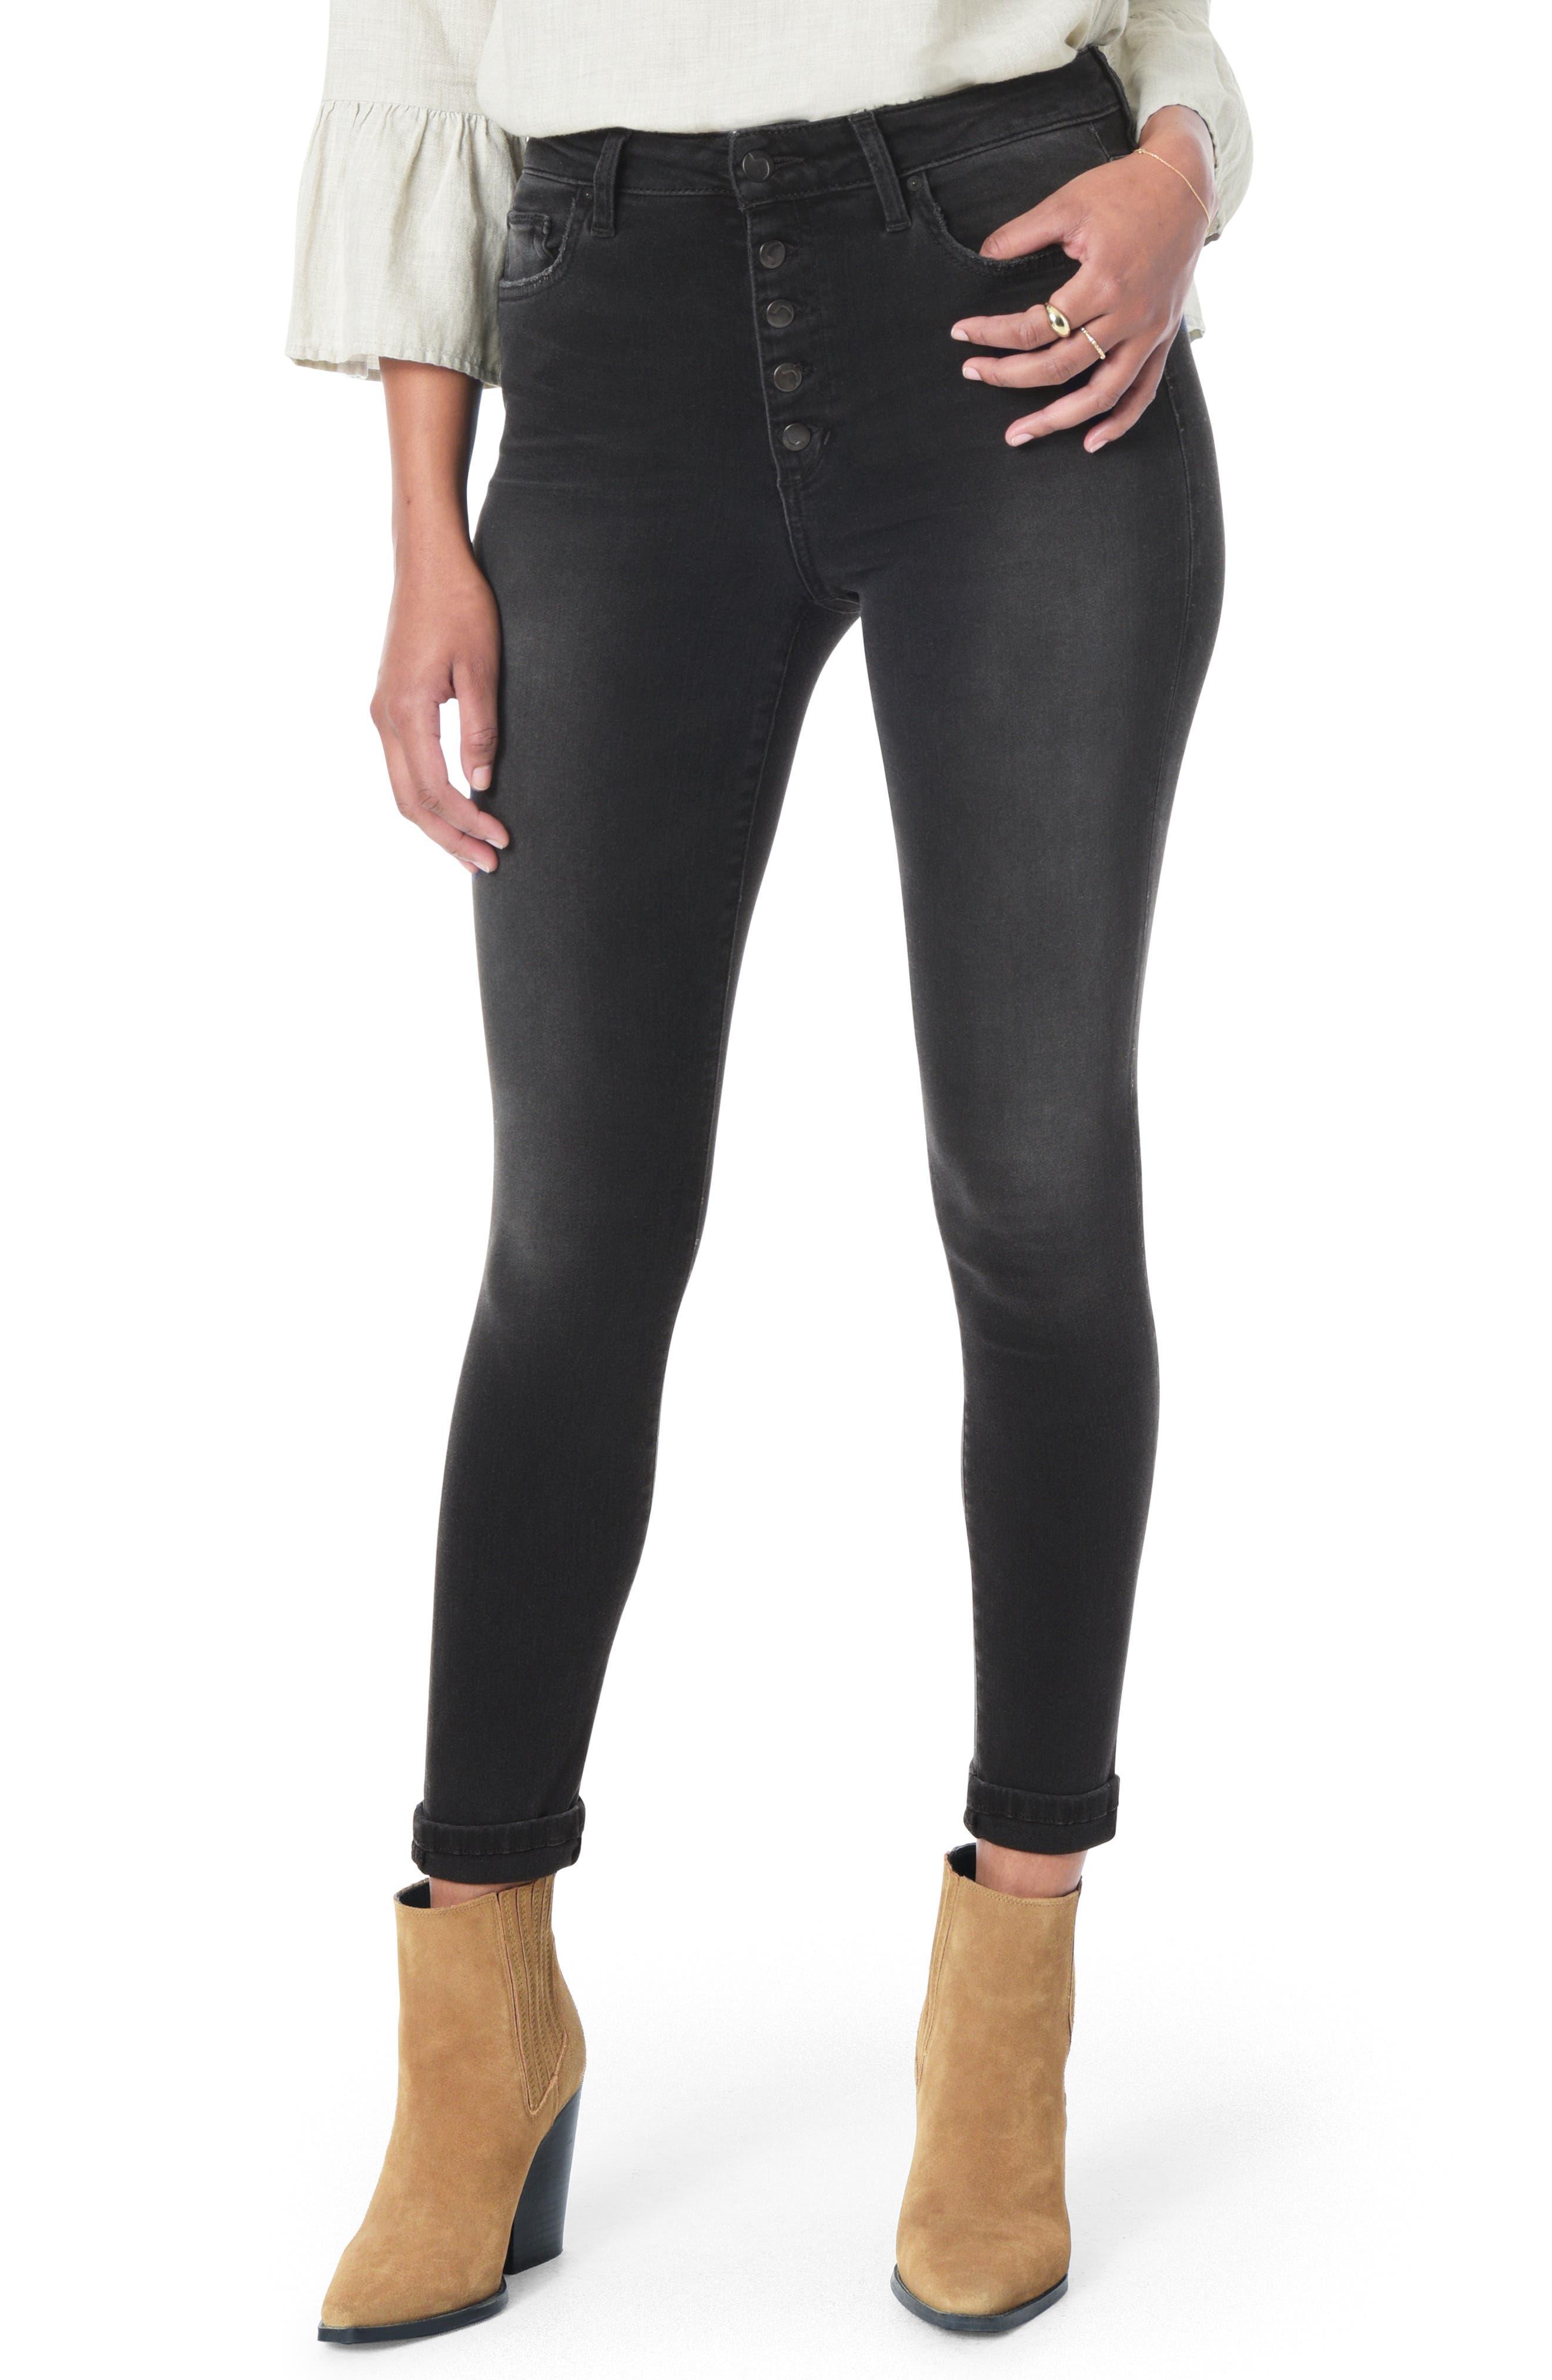 JOE'S Flawless - Honey Curvy High Waist Ankle Skinny Jeans, Main, color, GABBIE